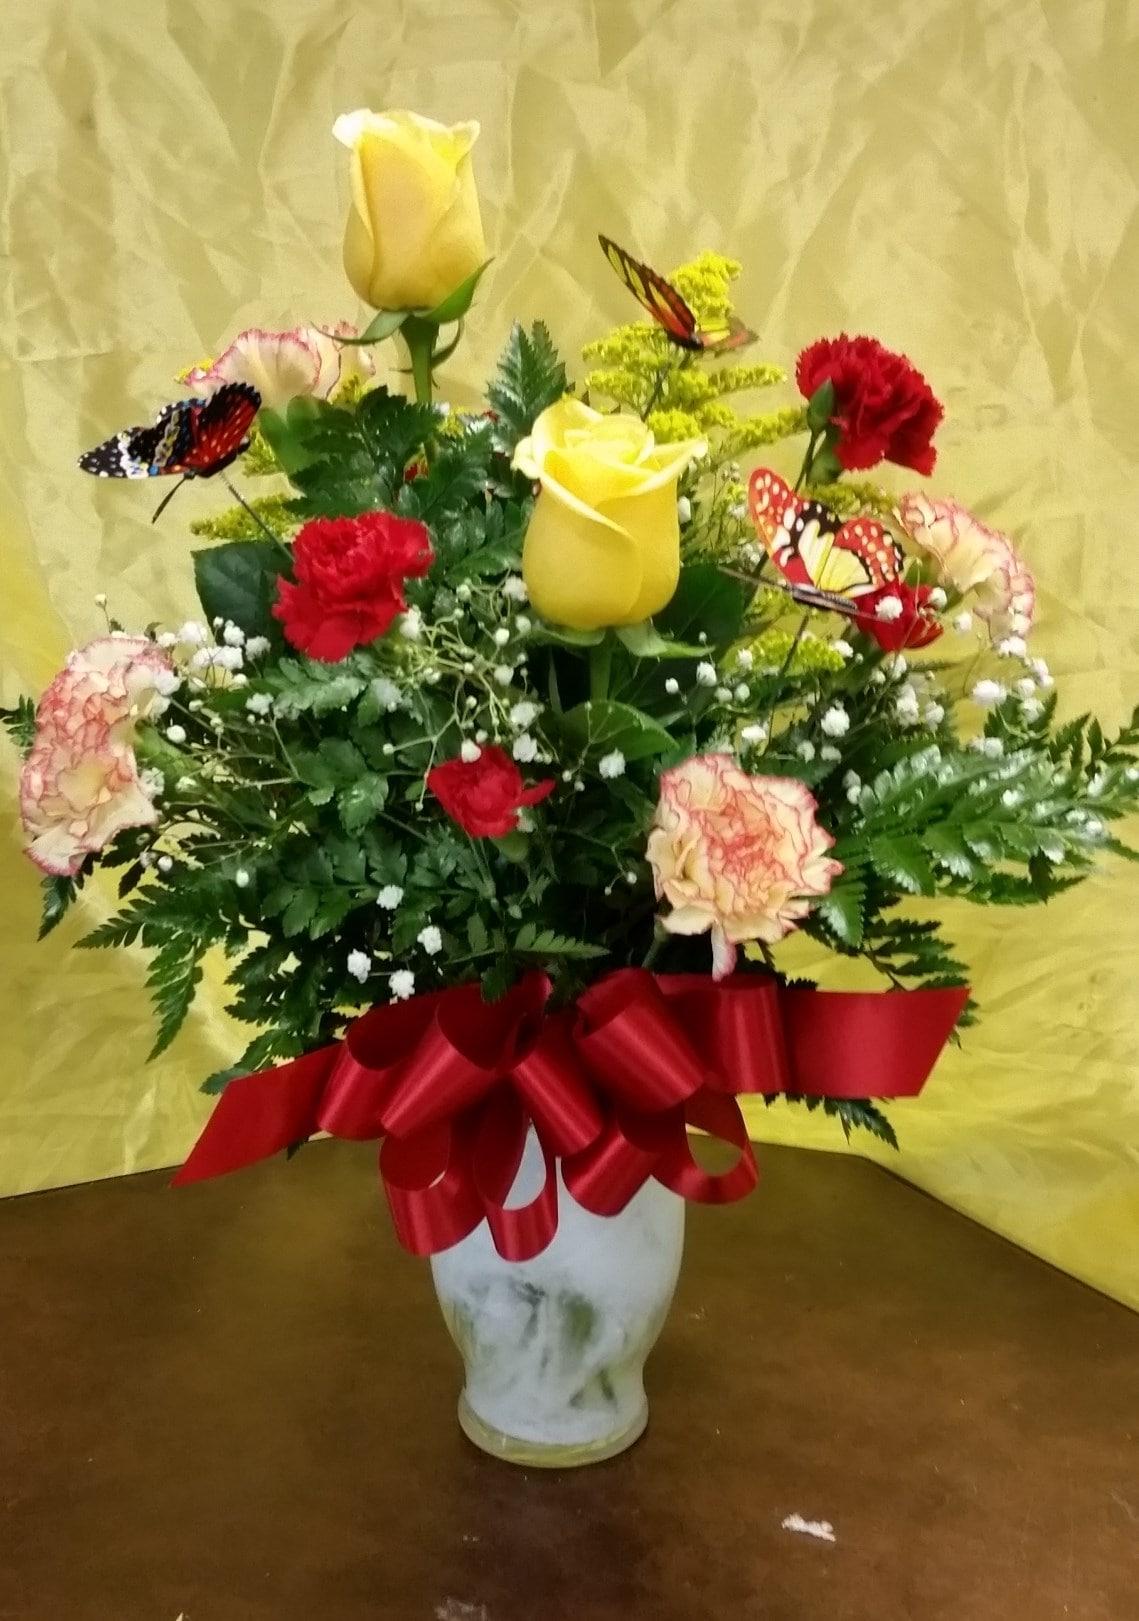 Summer Bouquets Delivery Delta Junction AK - Acacia Floral